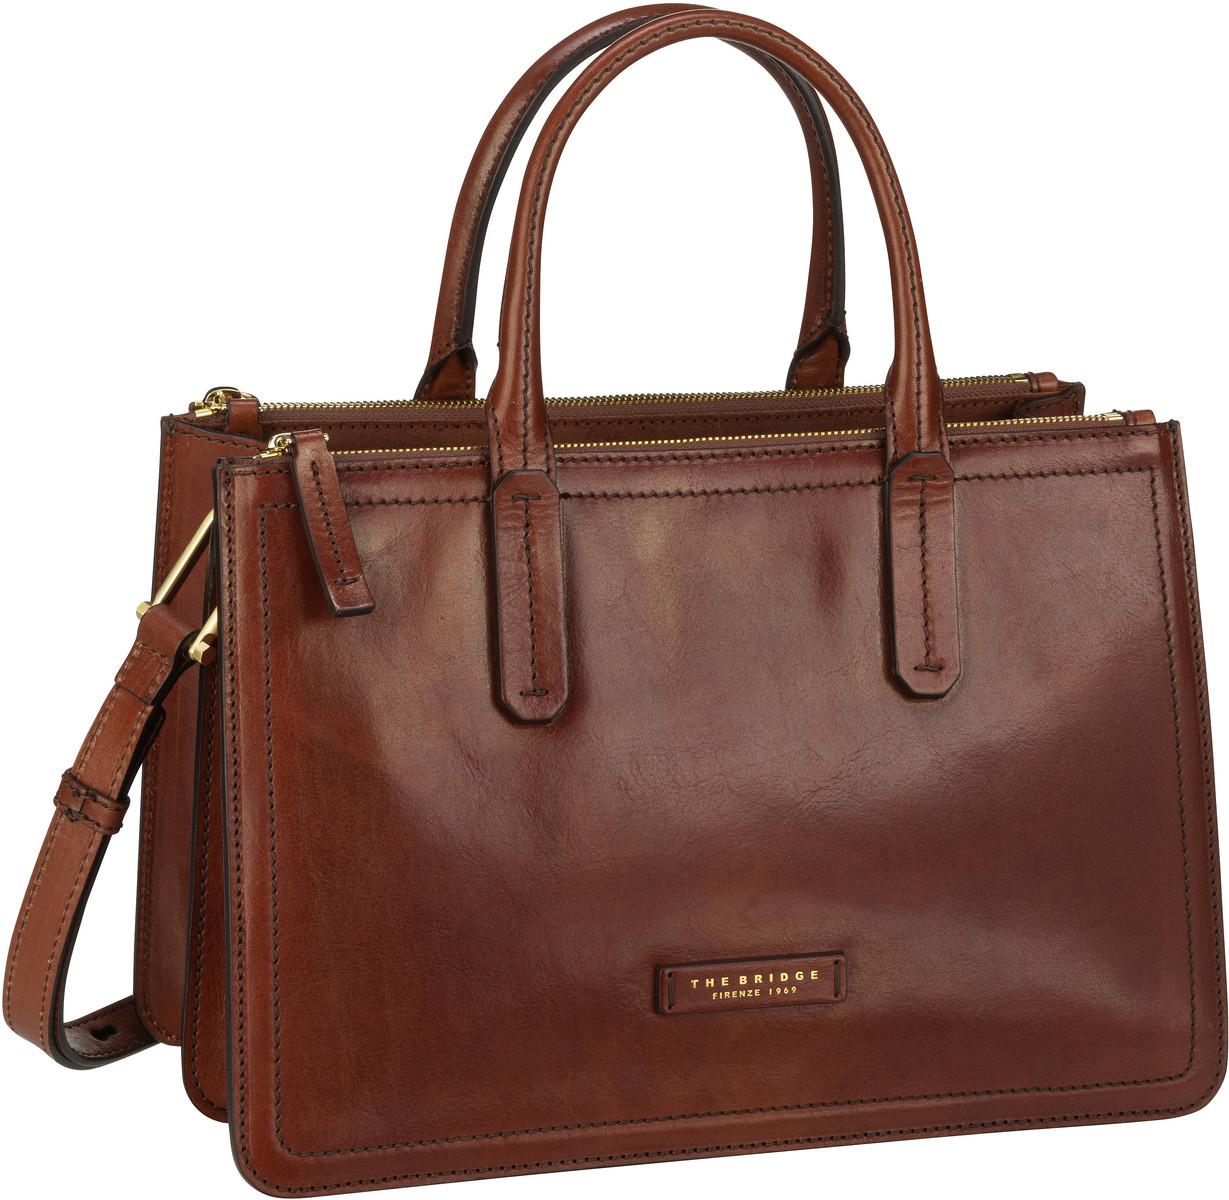 Handtasche Beatrice 4620 Marrone/Oro